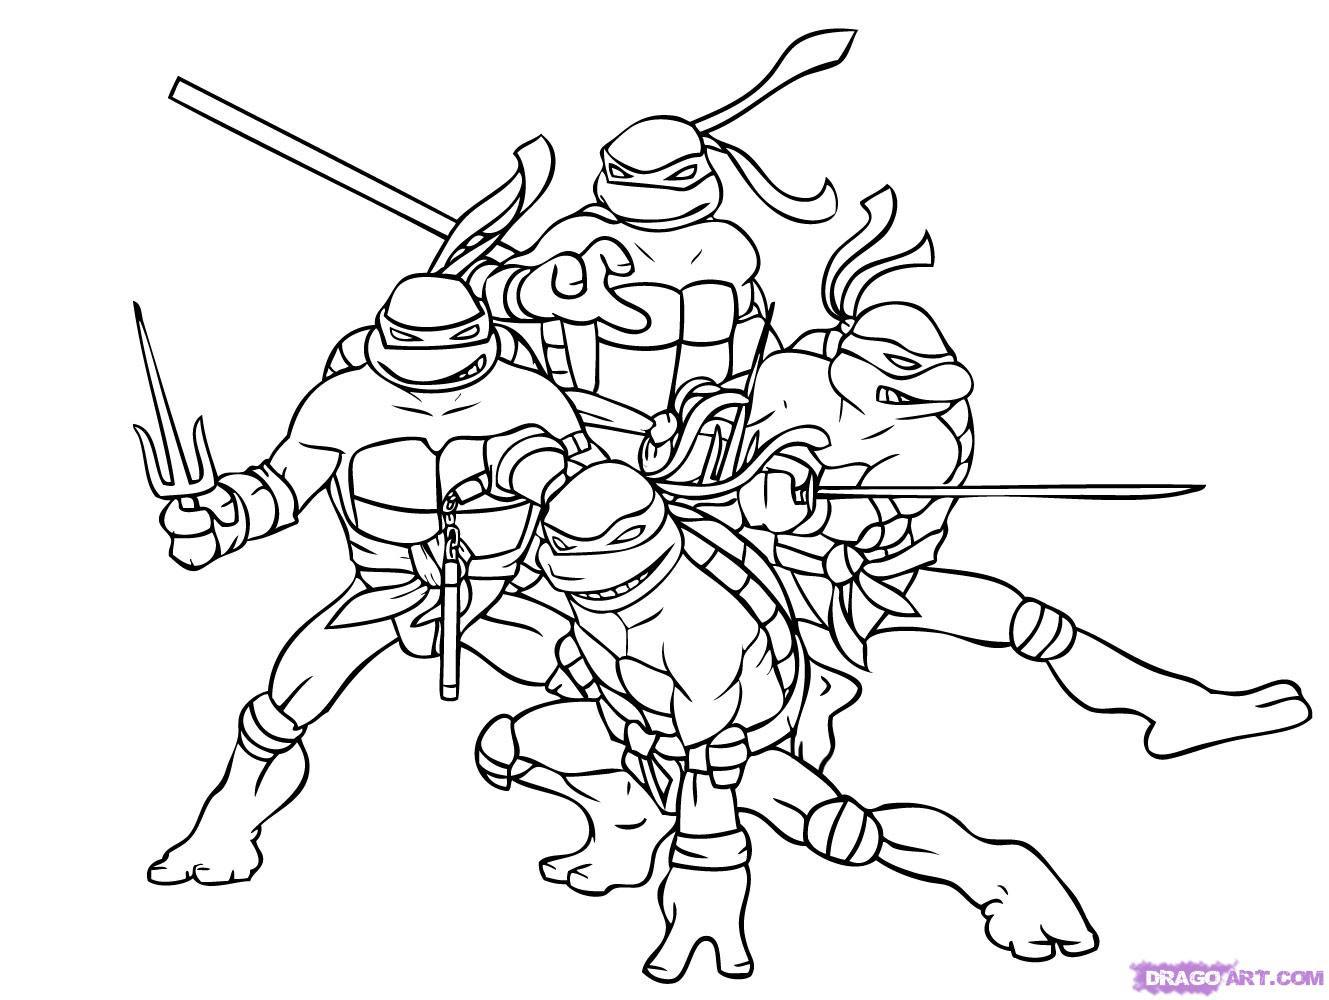 106 Dibujos De Las Tortugas Ninja Para Colorear Oh Kids Page 10